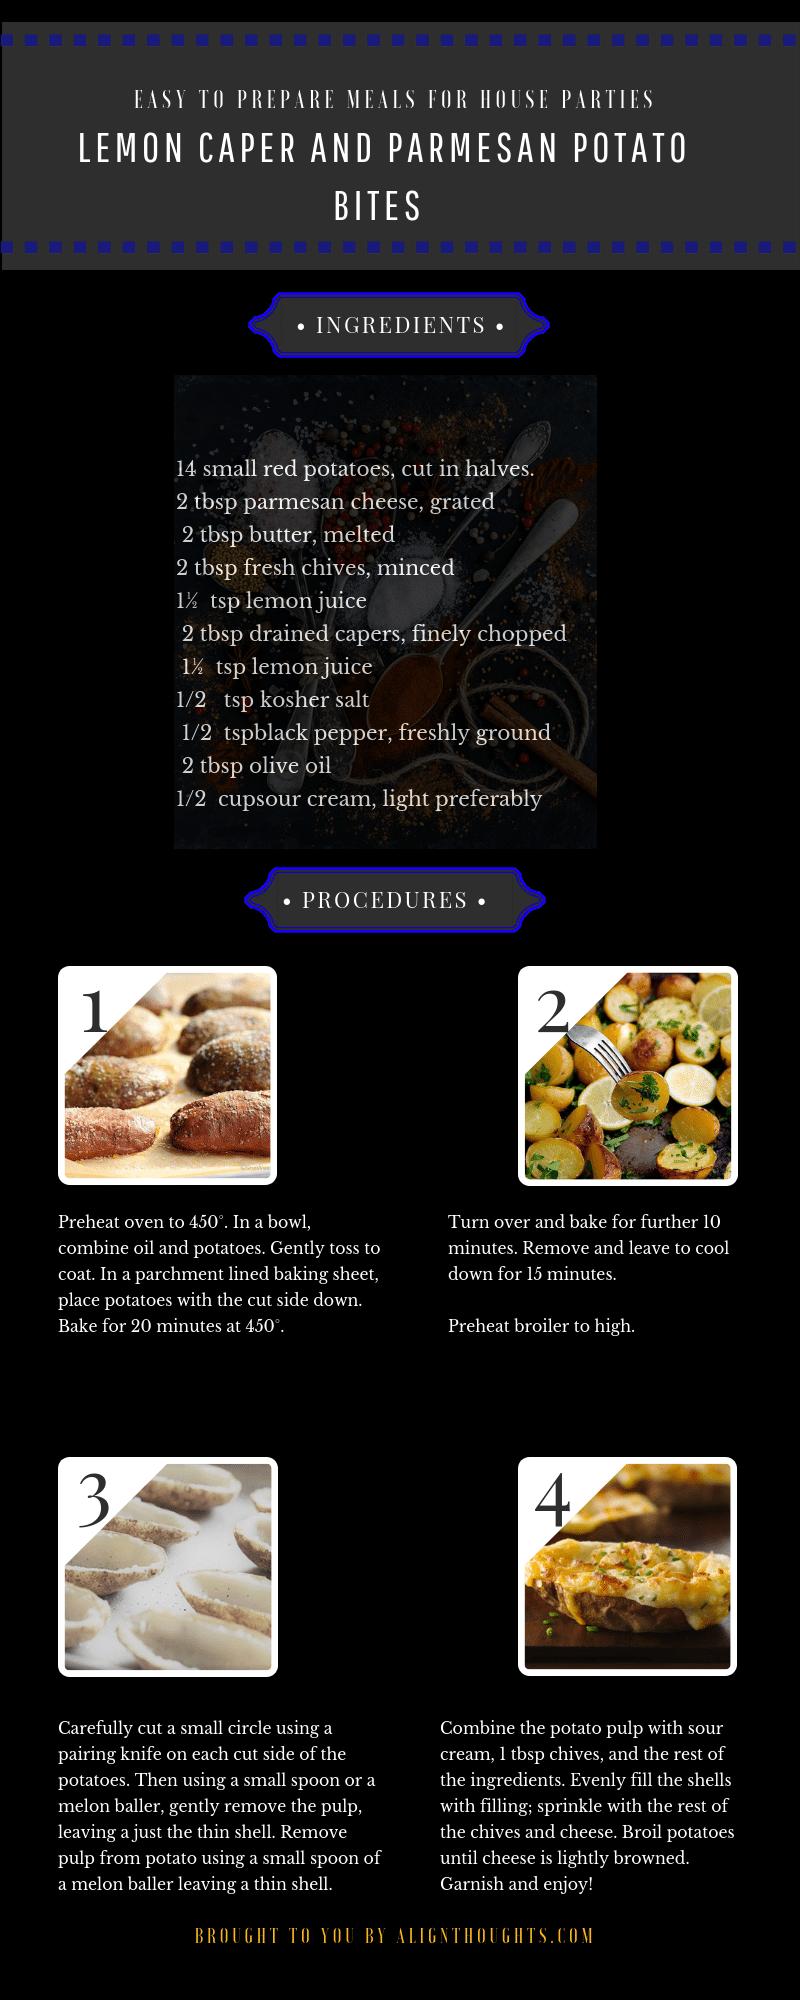 How To Prepare Lemon Caper and Parmesan Potato Bites